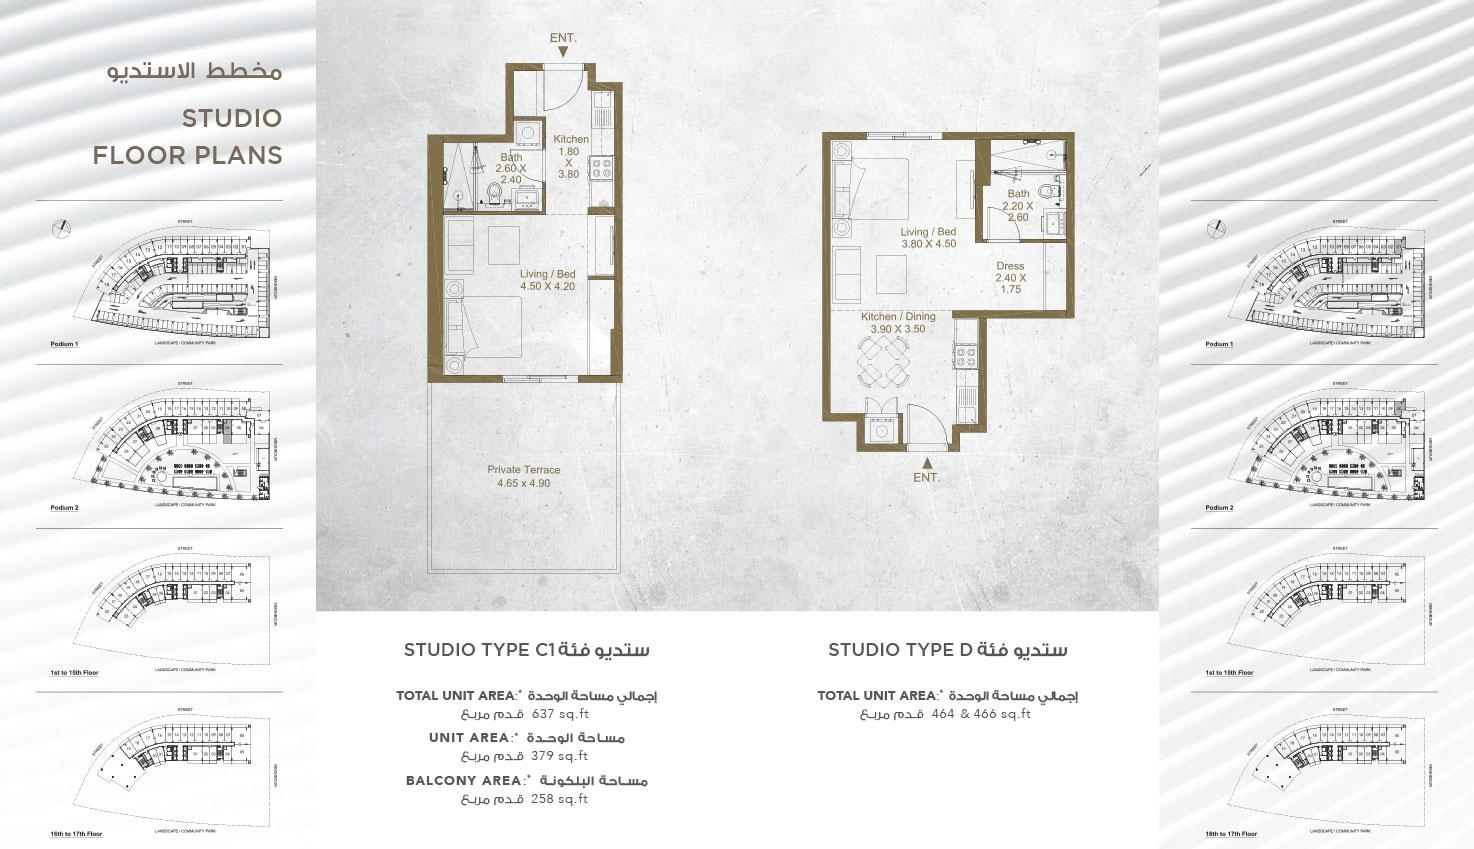 https://drehomes.com/wp-content/uploads/Studio-Type-C1-Unit-Area-637SqFt.jpg